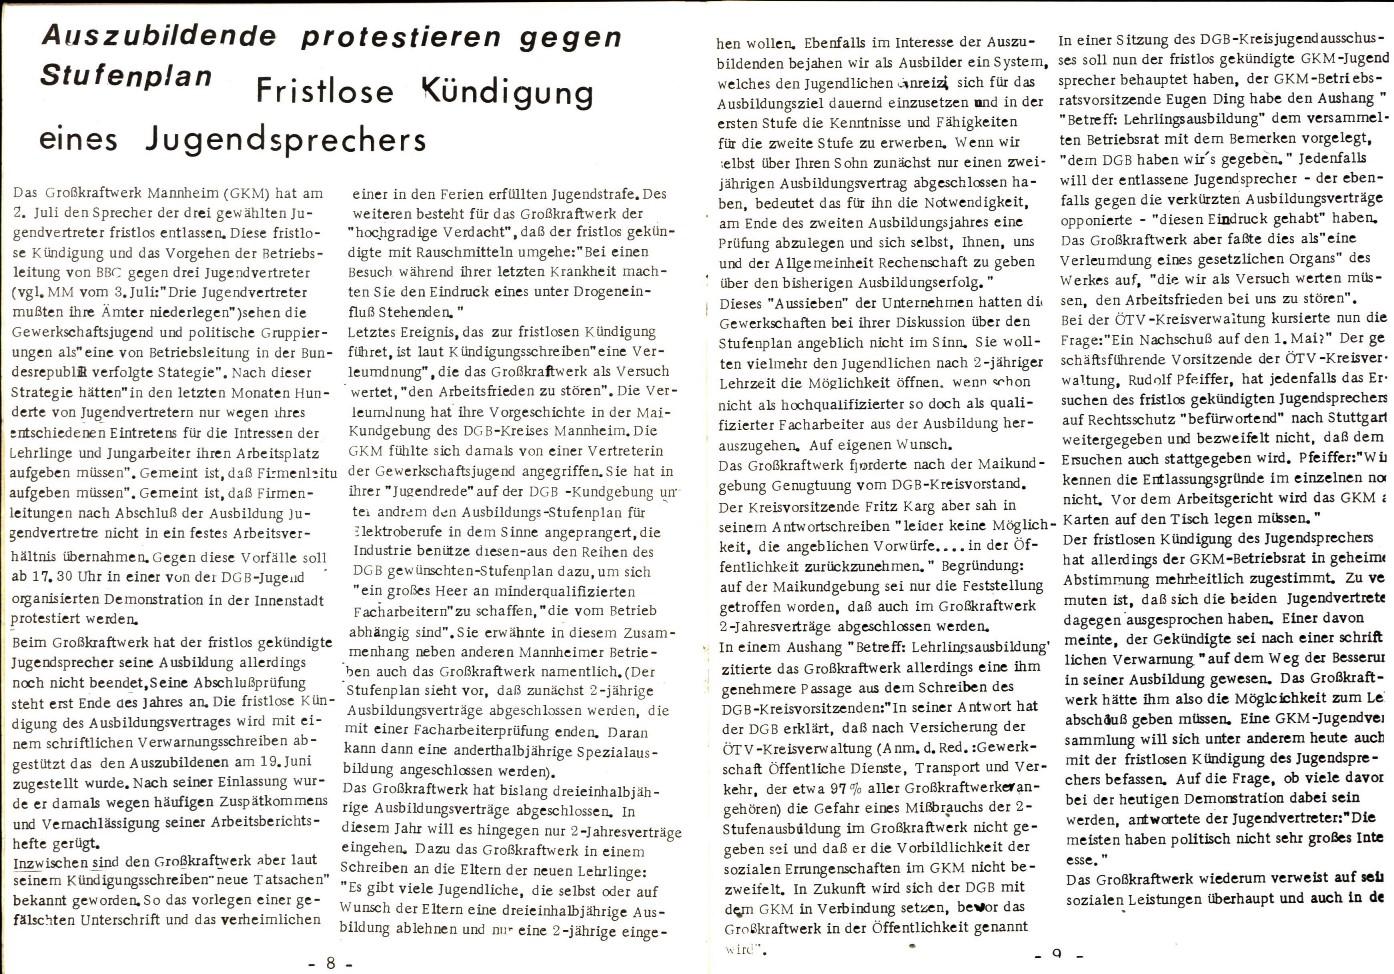 KJV_1973_NK_Arbeiterjugend_06